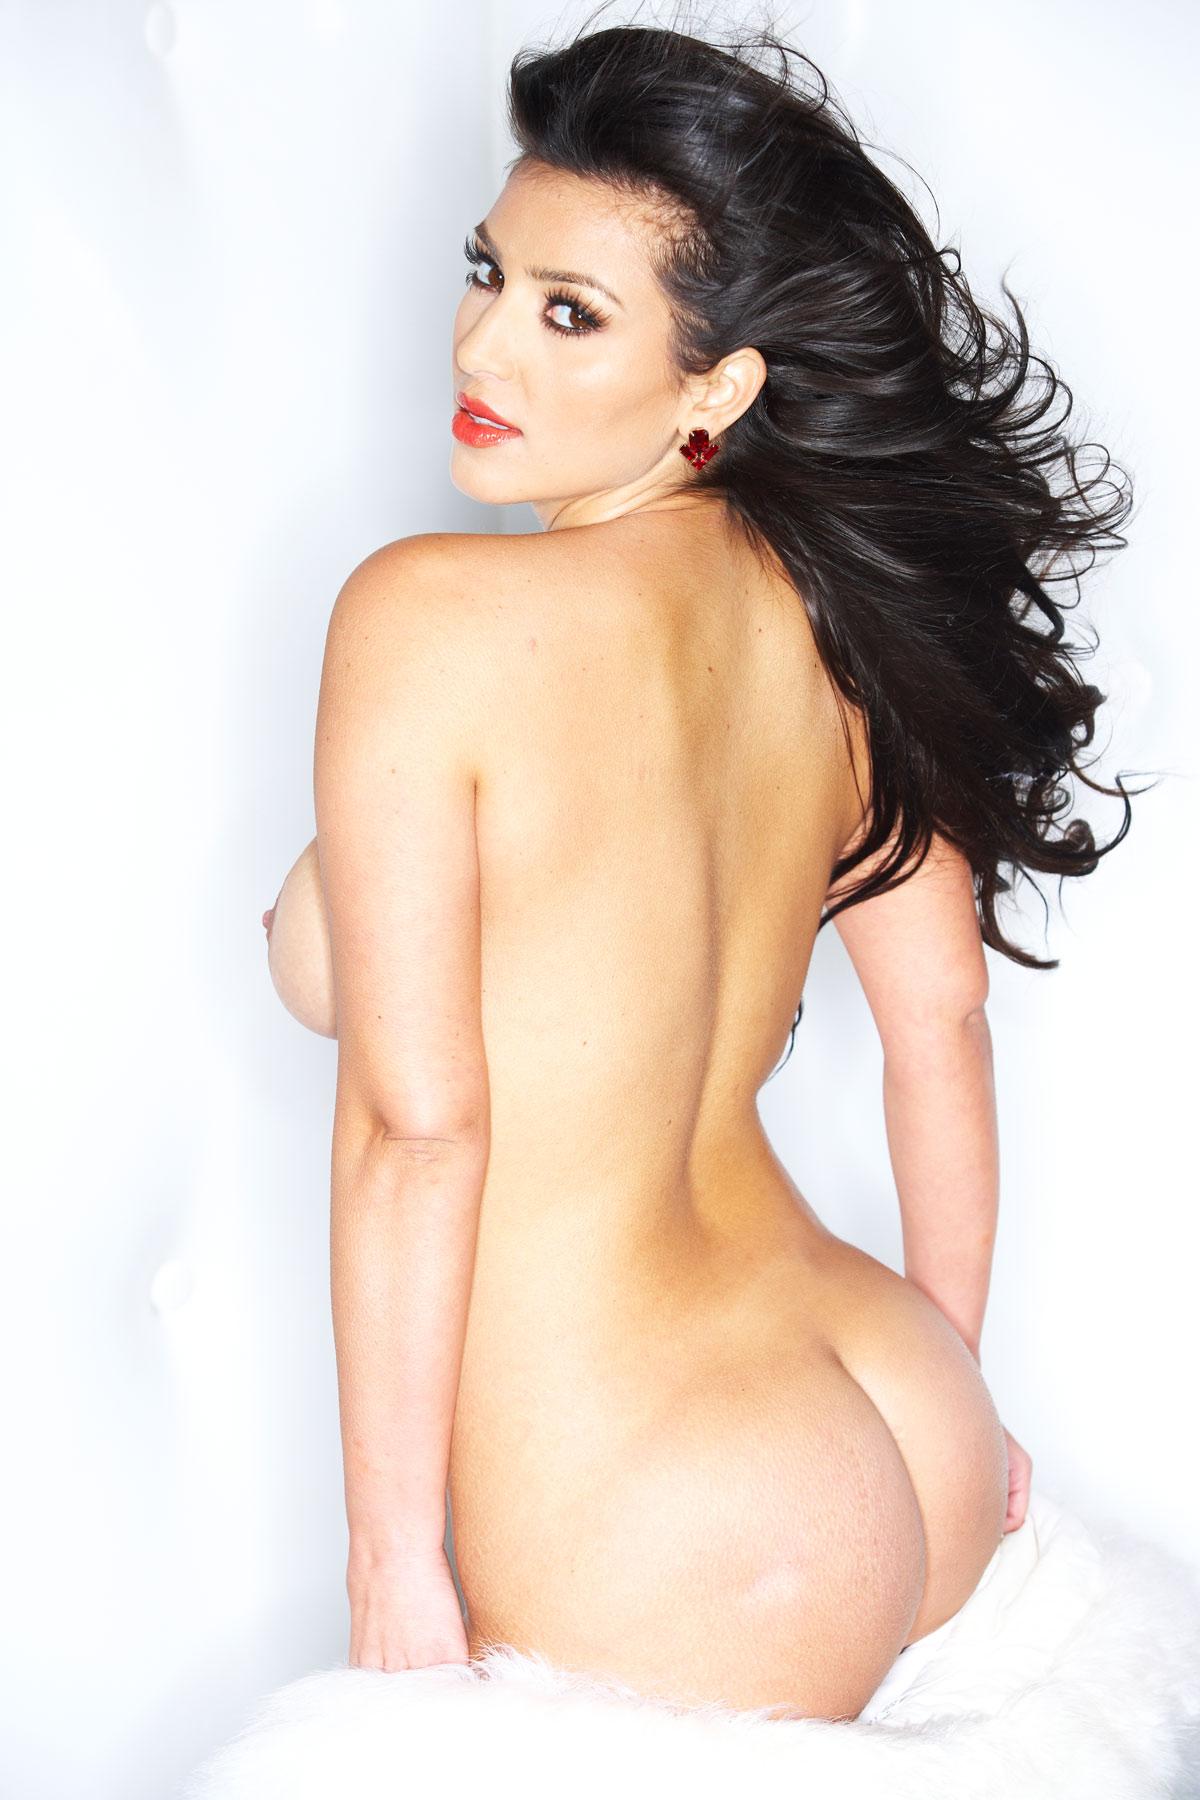 Kim kardashian's sexiest moments